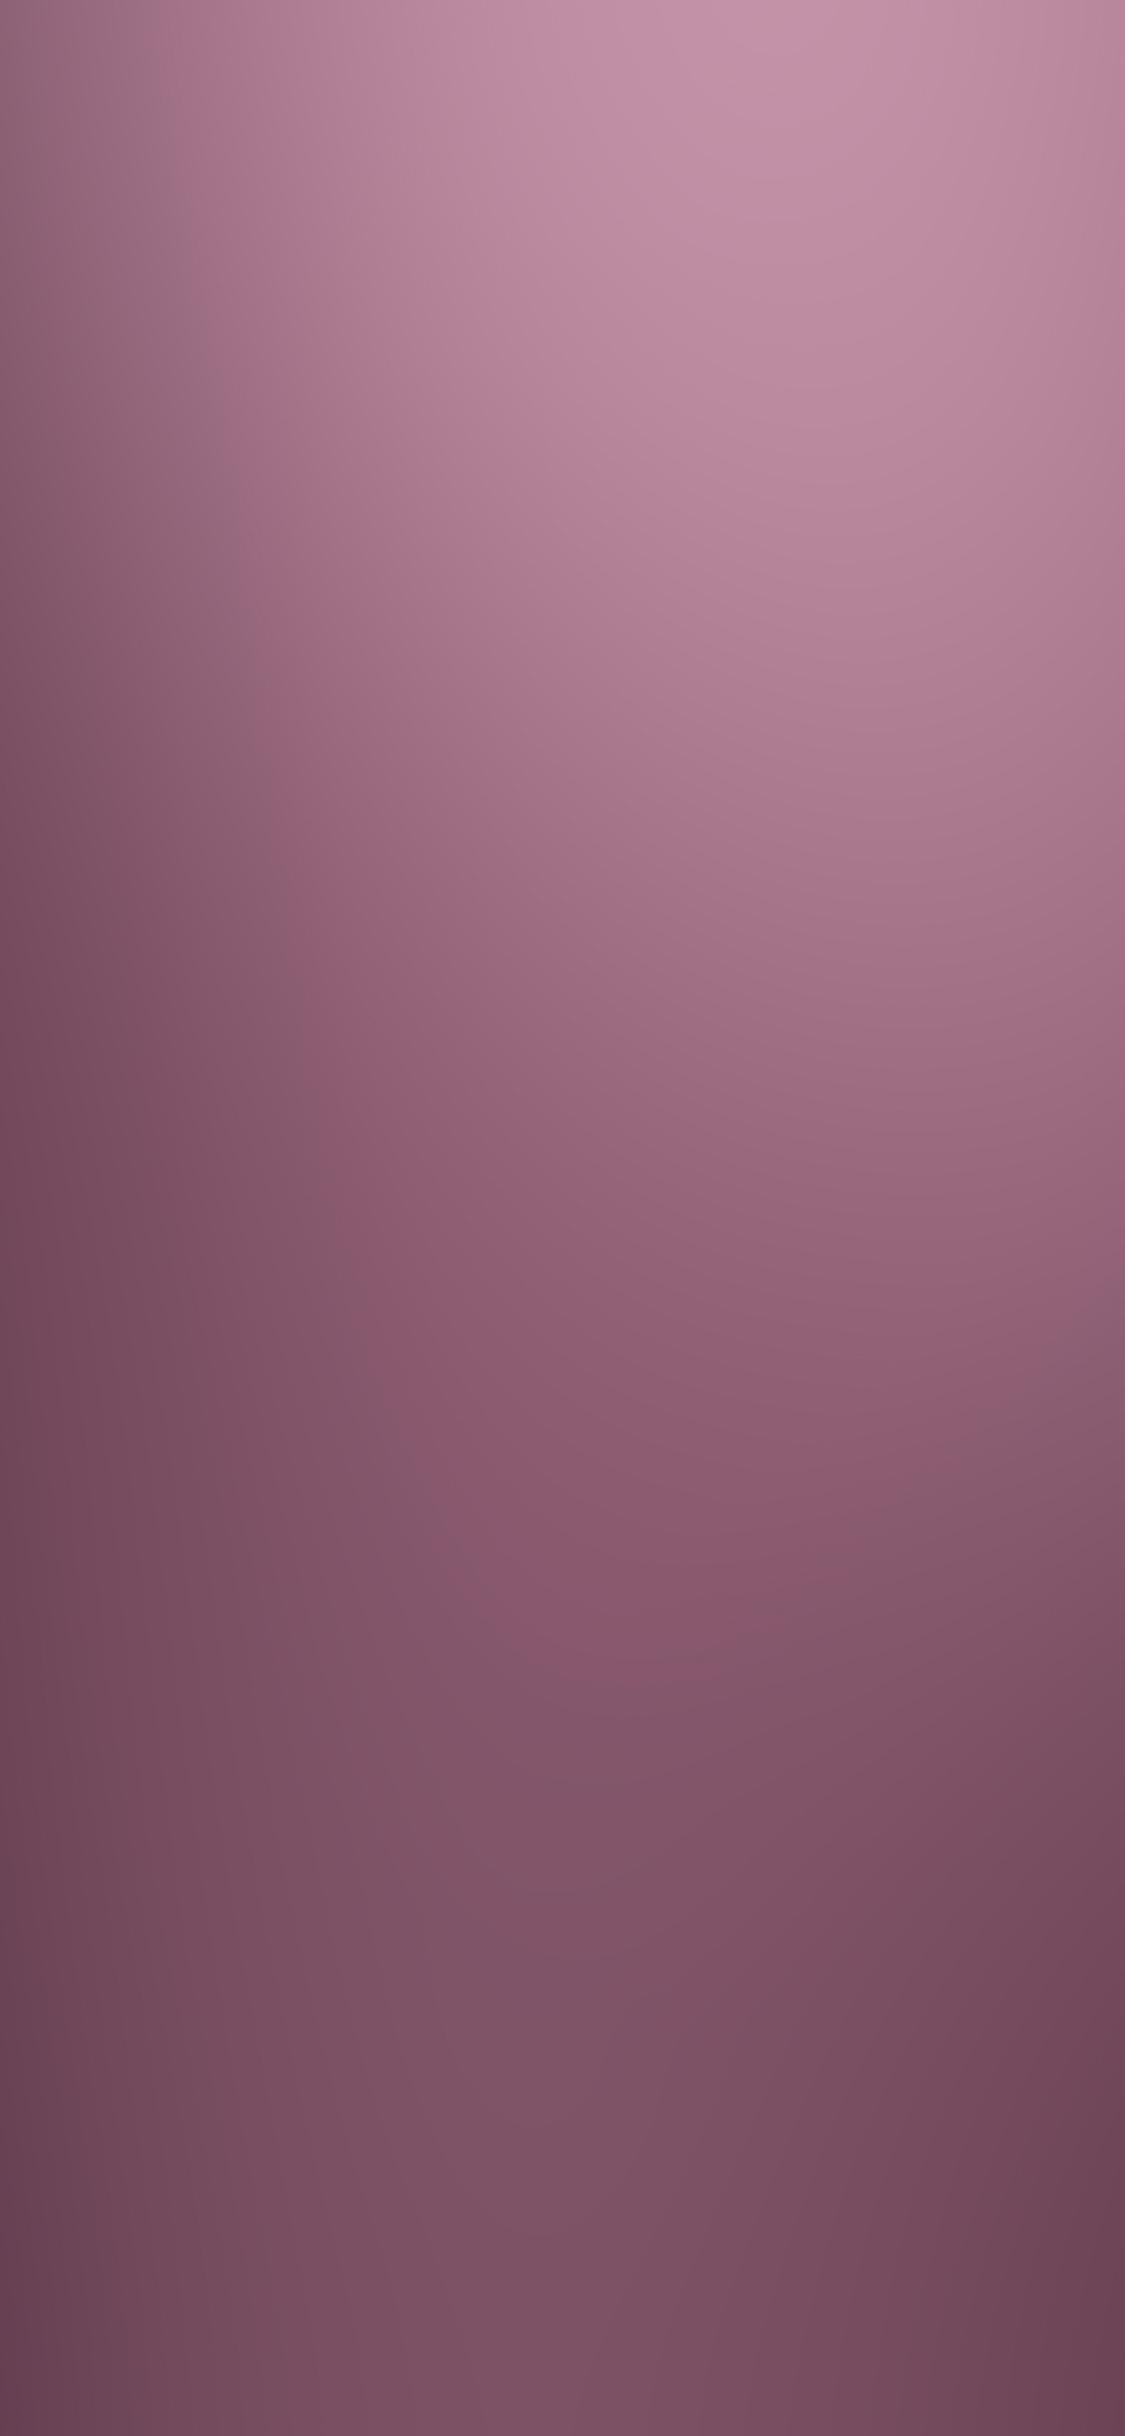 iPhoneXpapers.com-Apple-iPhone-wallpaper-sf87-purple-violet-solid-gradation-blur